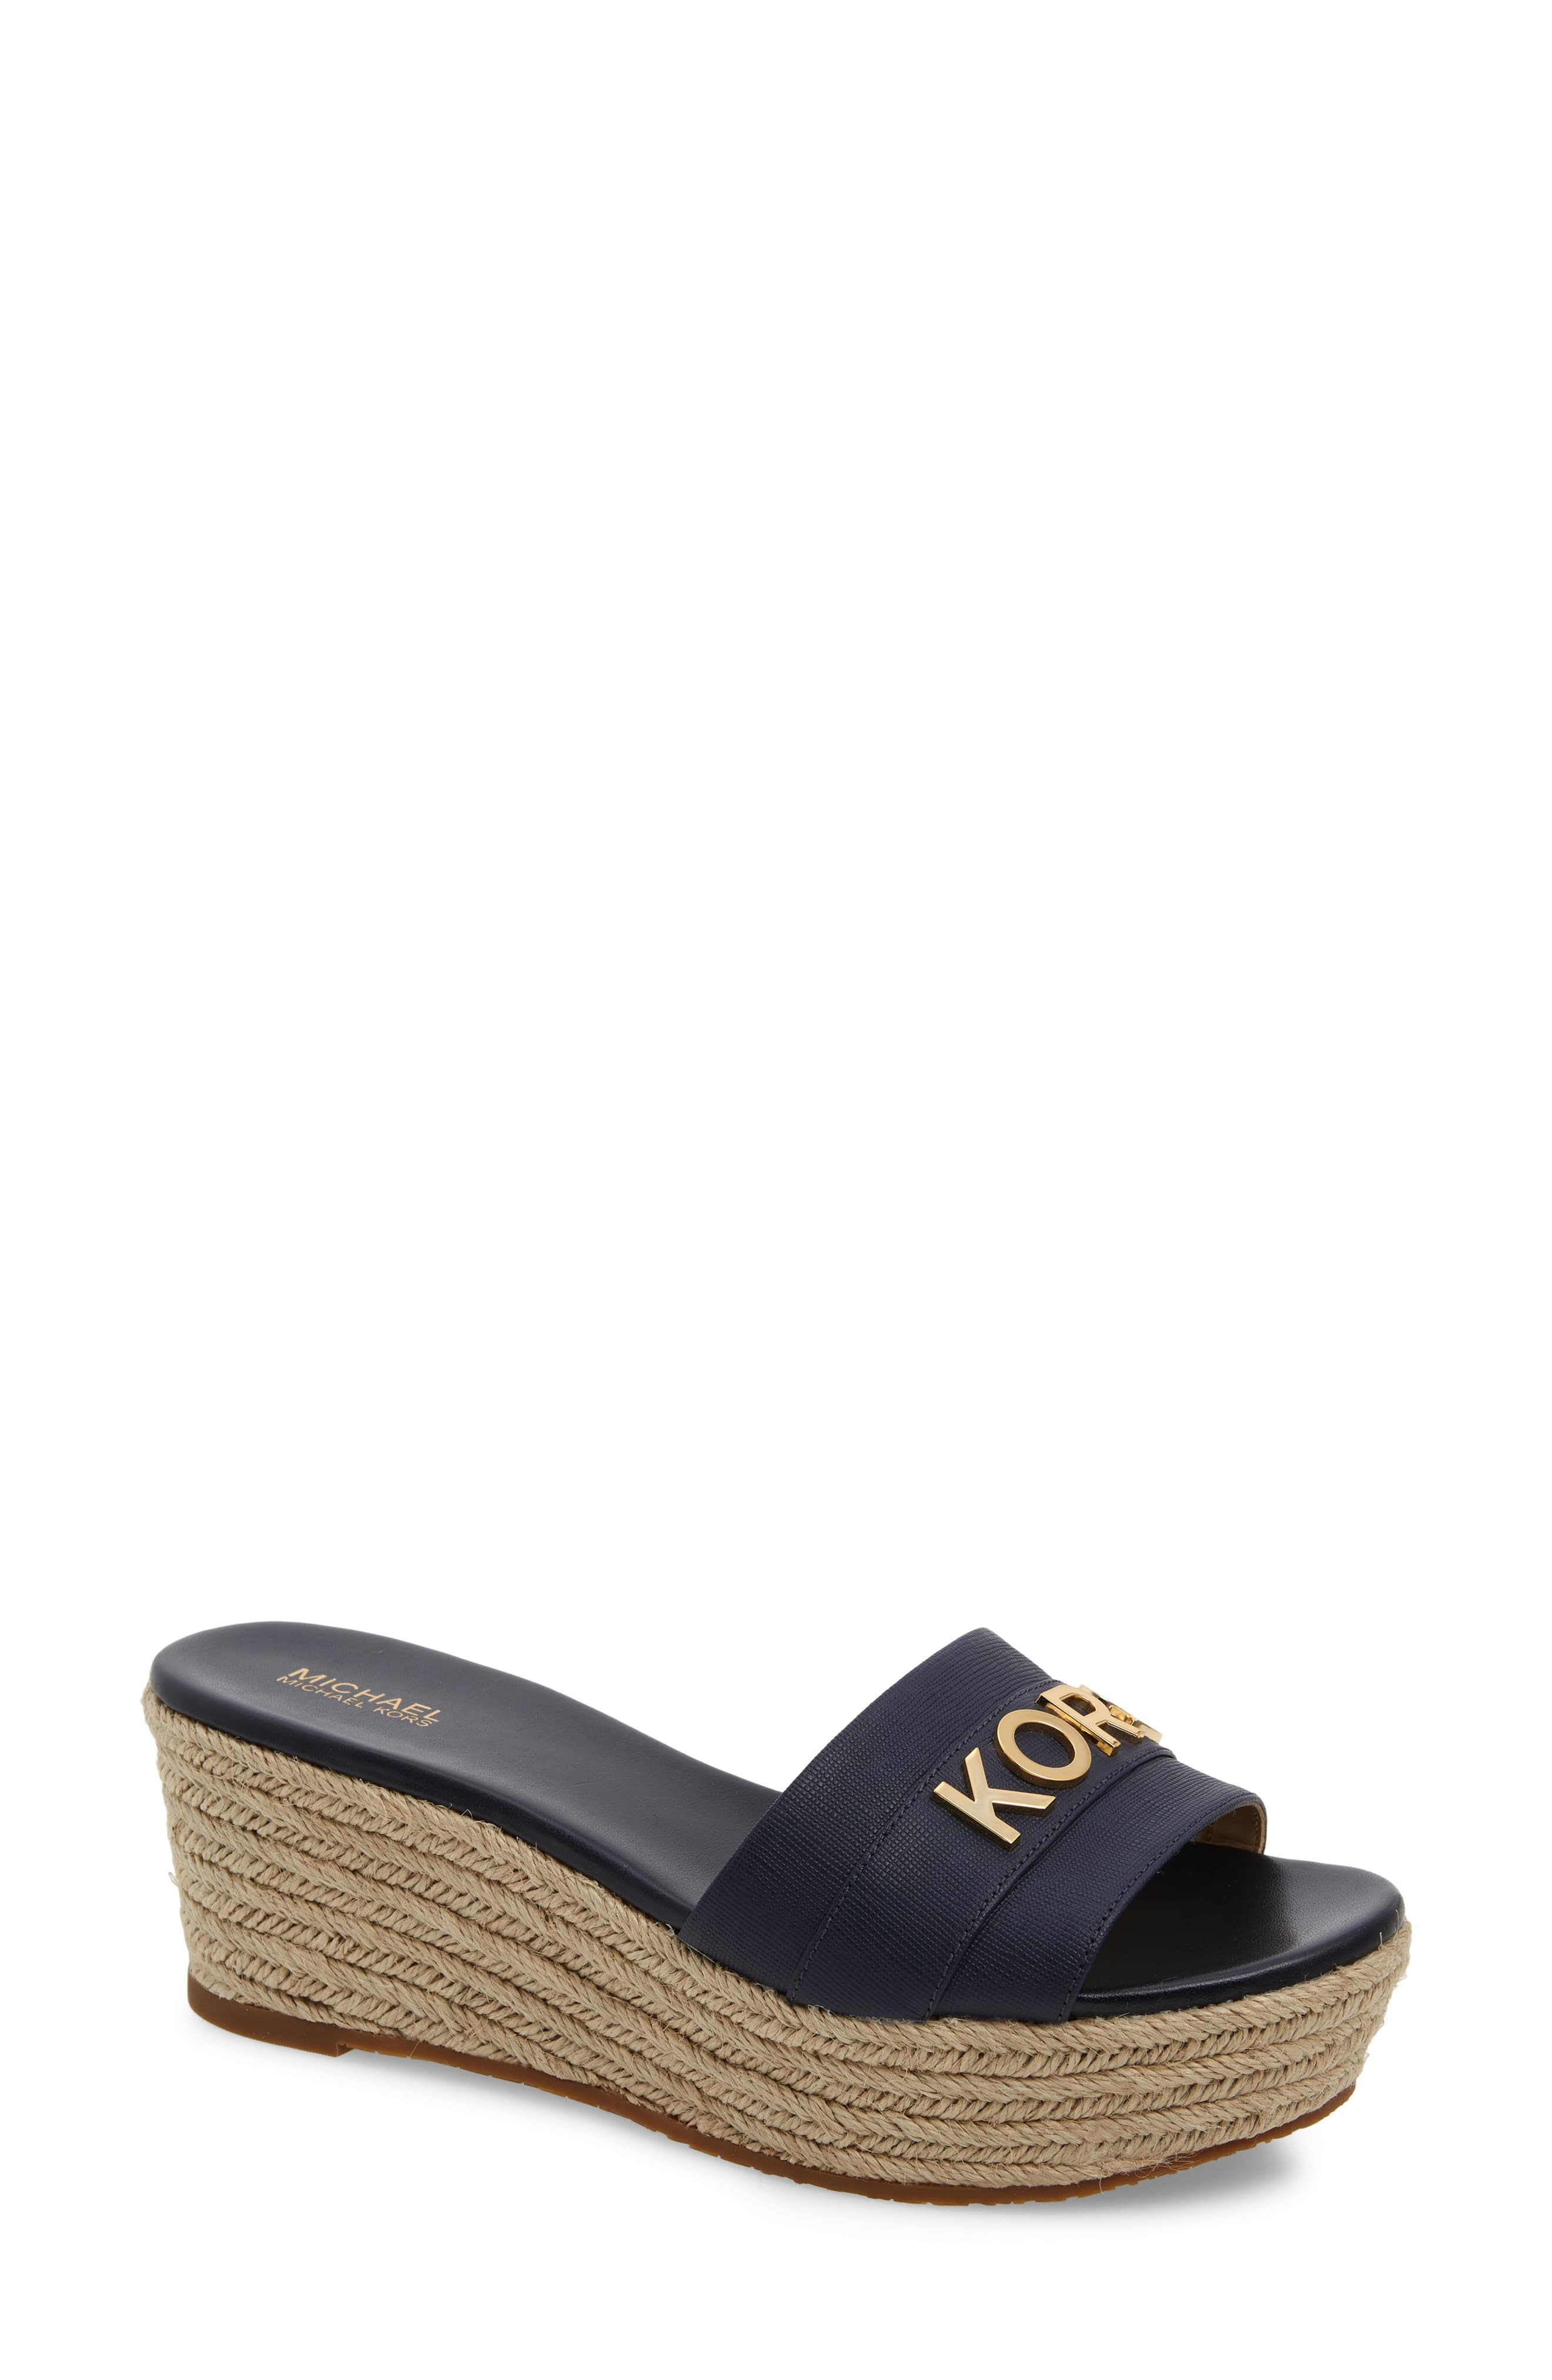 brady platform slide sandals purchase